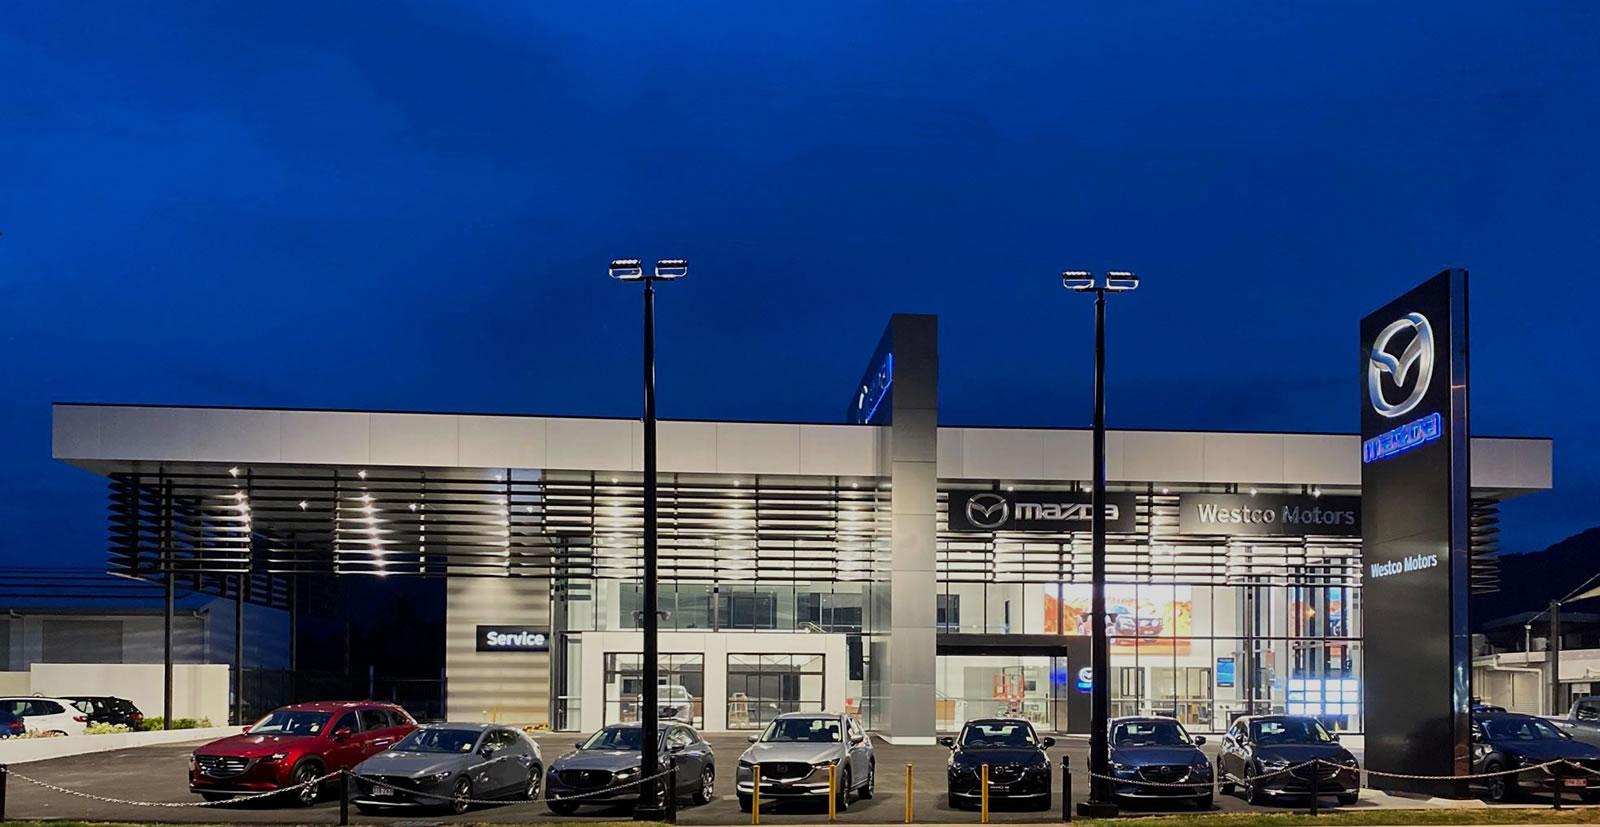 Car Dealership For Sale Perth